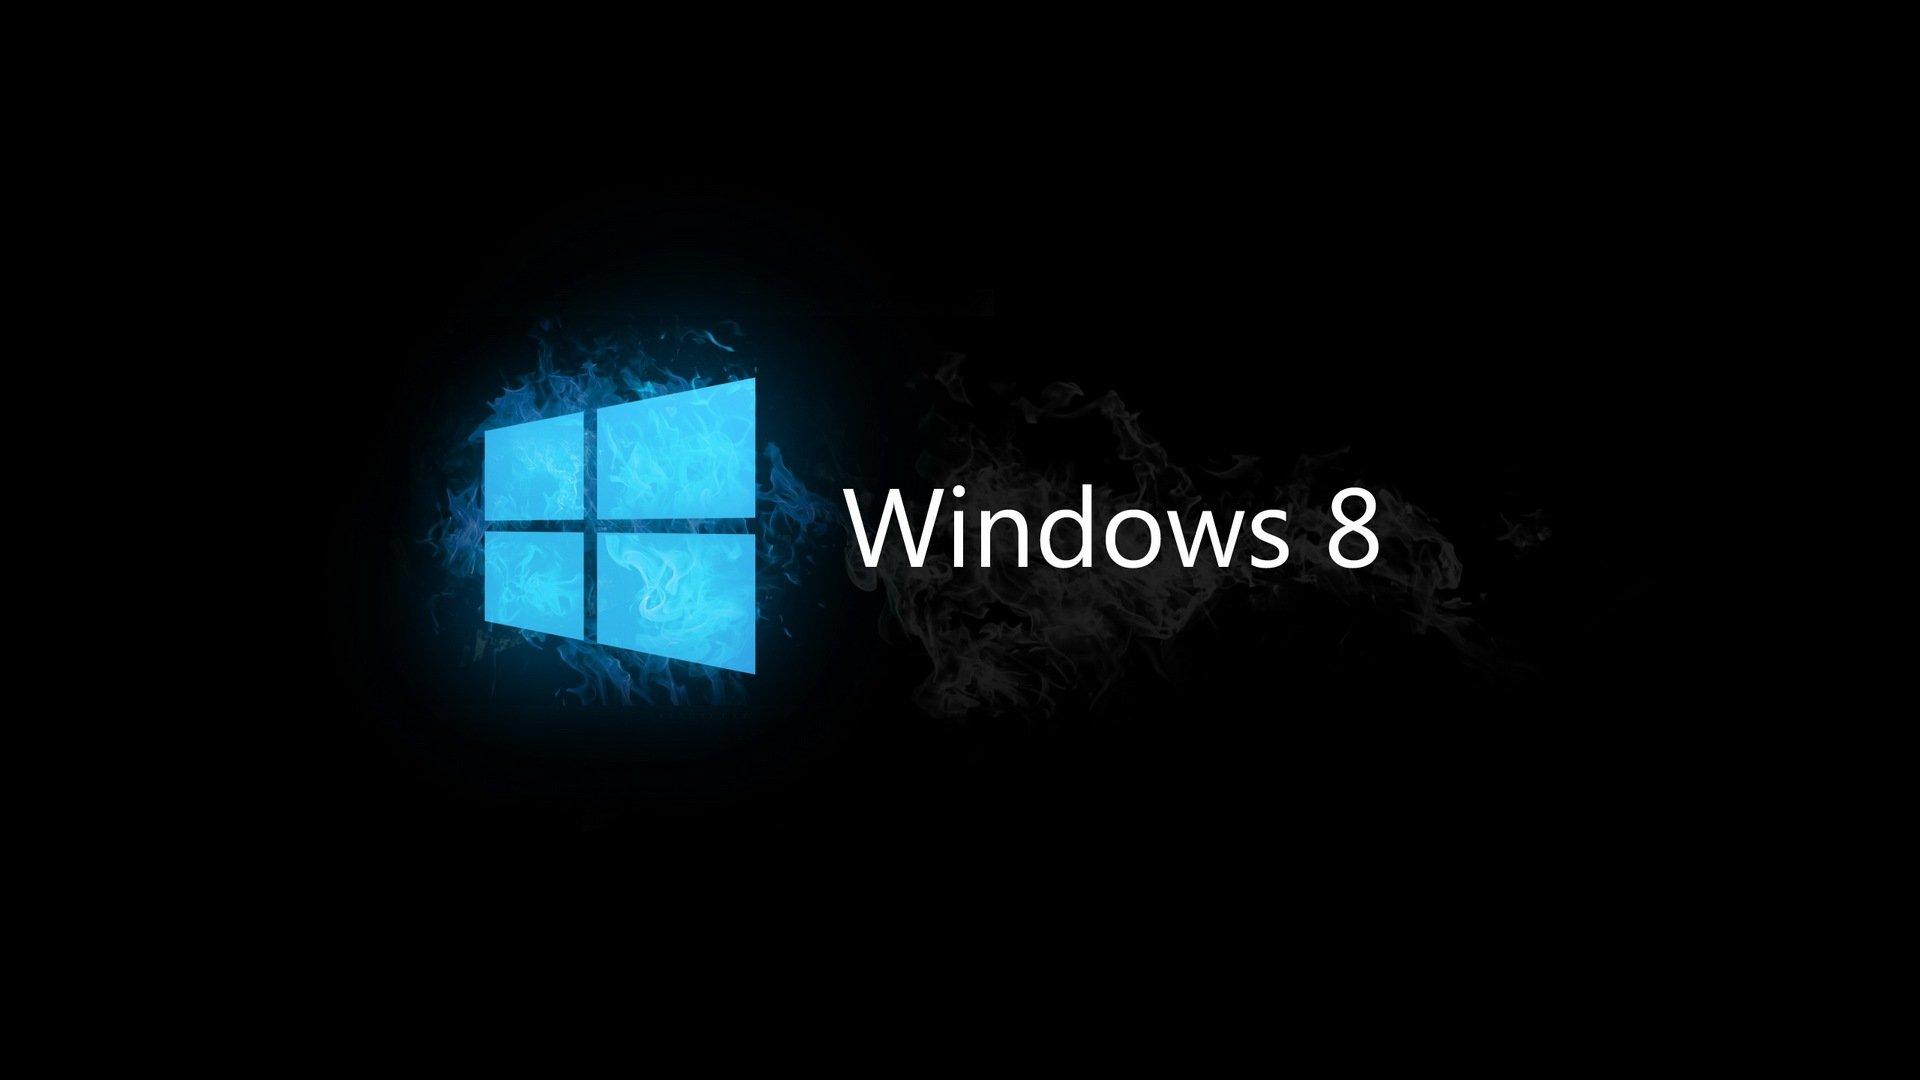 45 Windows 8 1 Hd Wallpapers 1920x1080 On Wallpapersafari